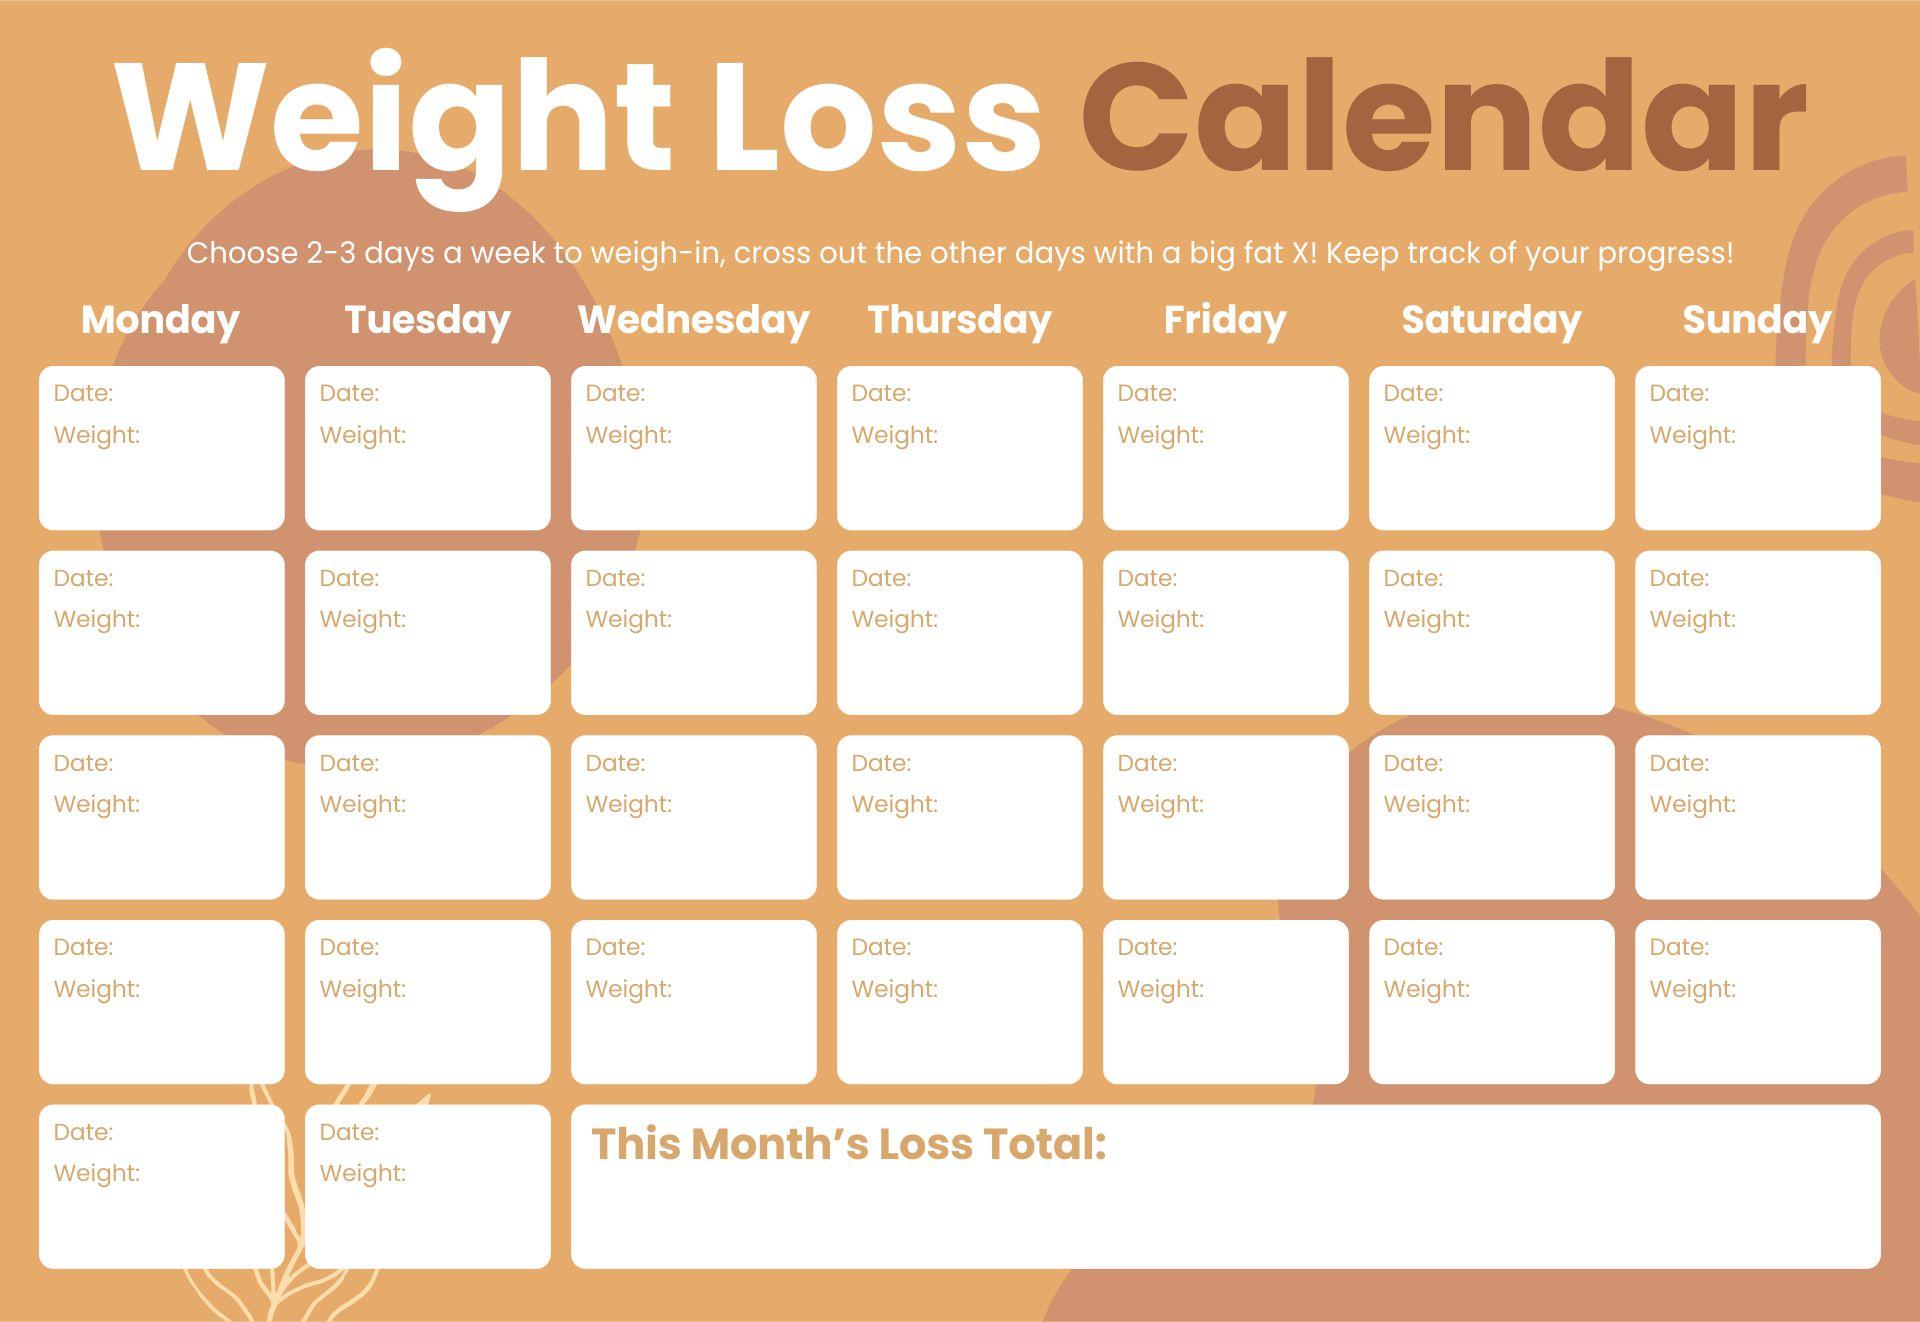 Weight Loss Calendar Printable